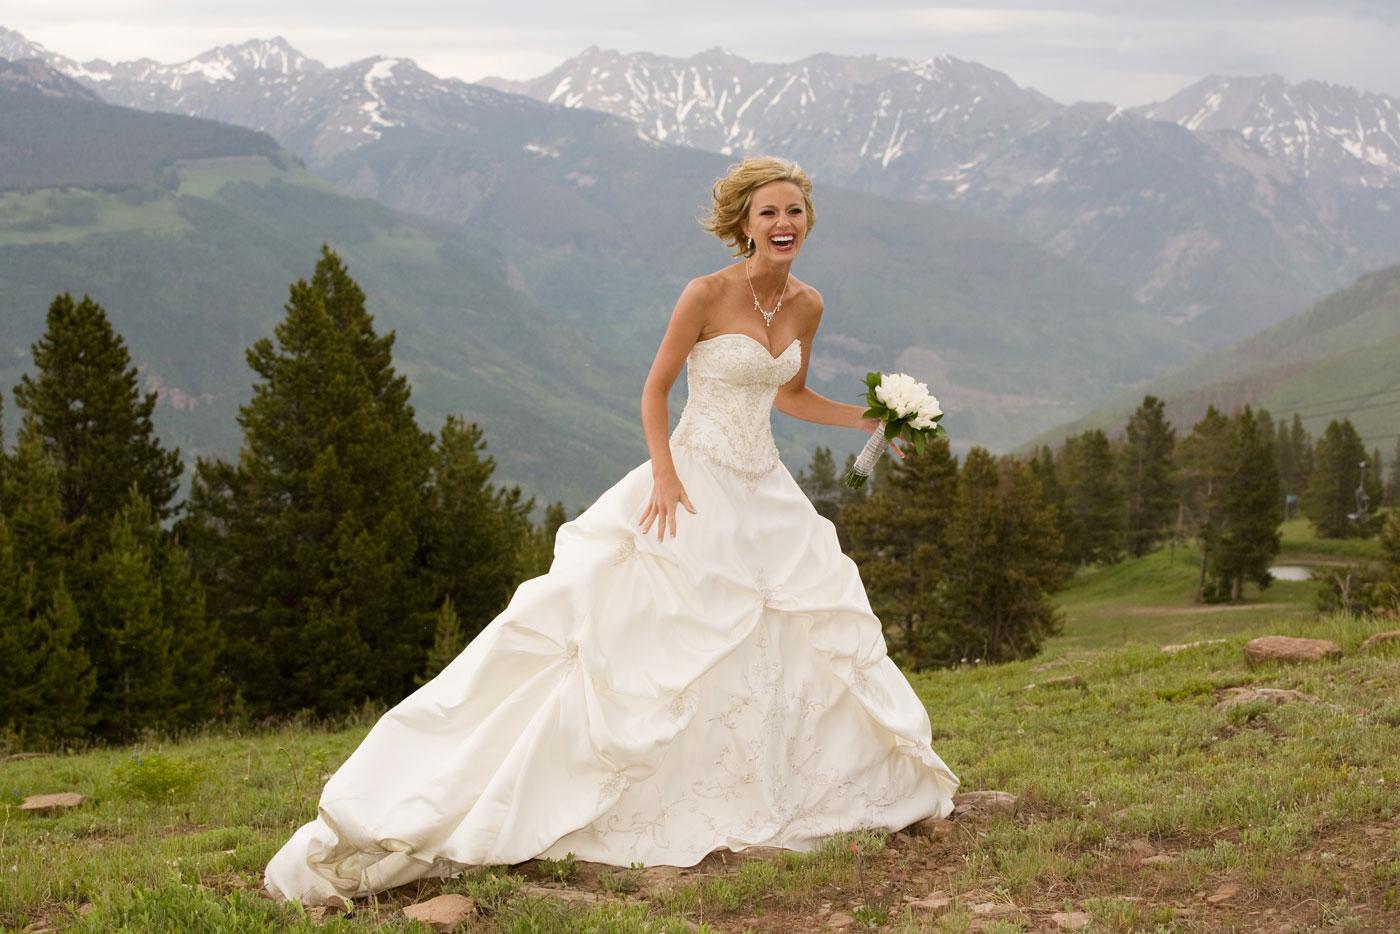 Vail Wedding Photographer Toni Axelrod on Vail Mountain